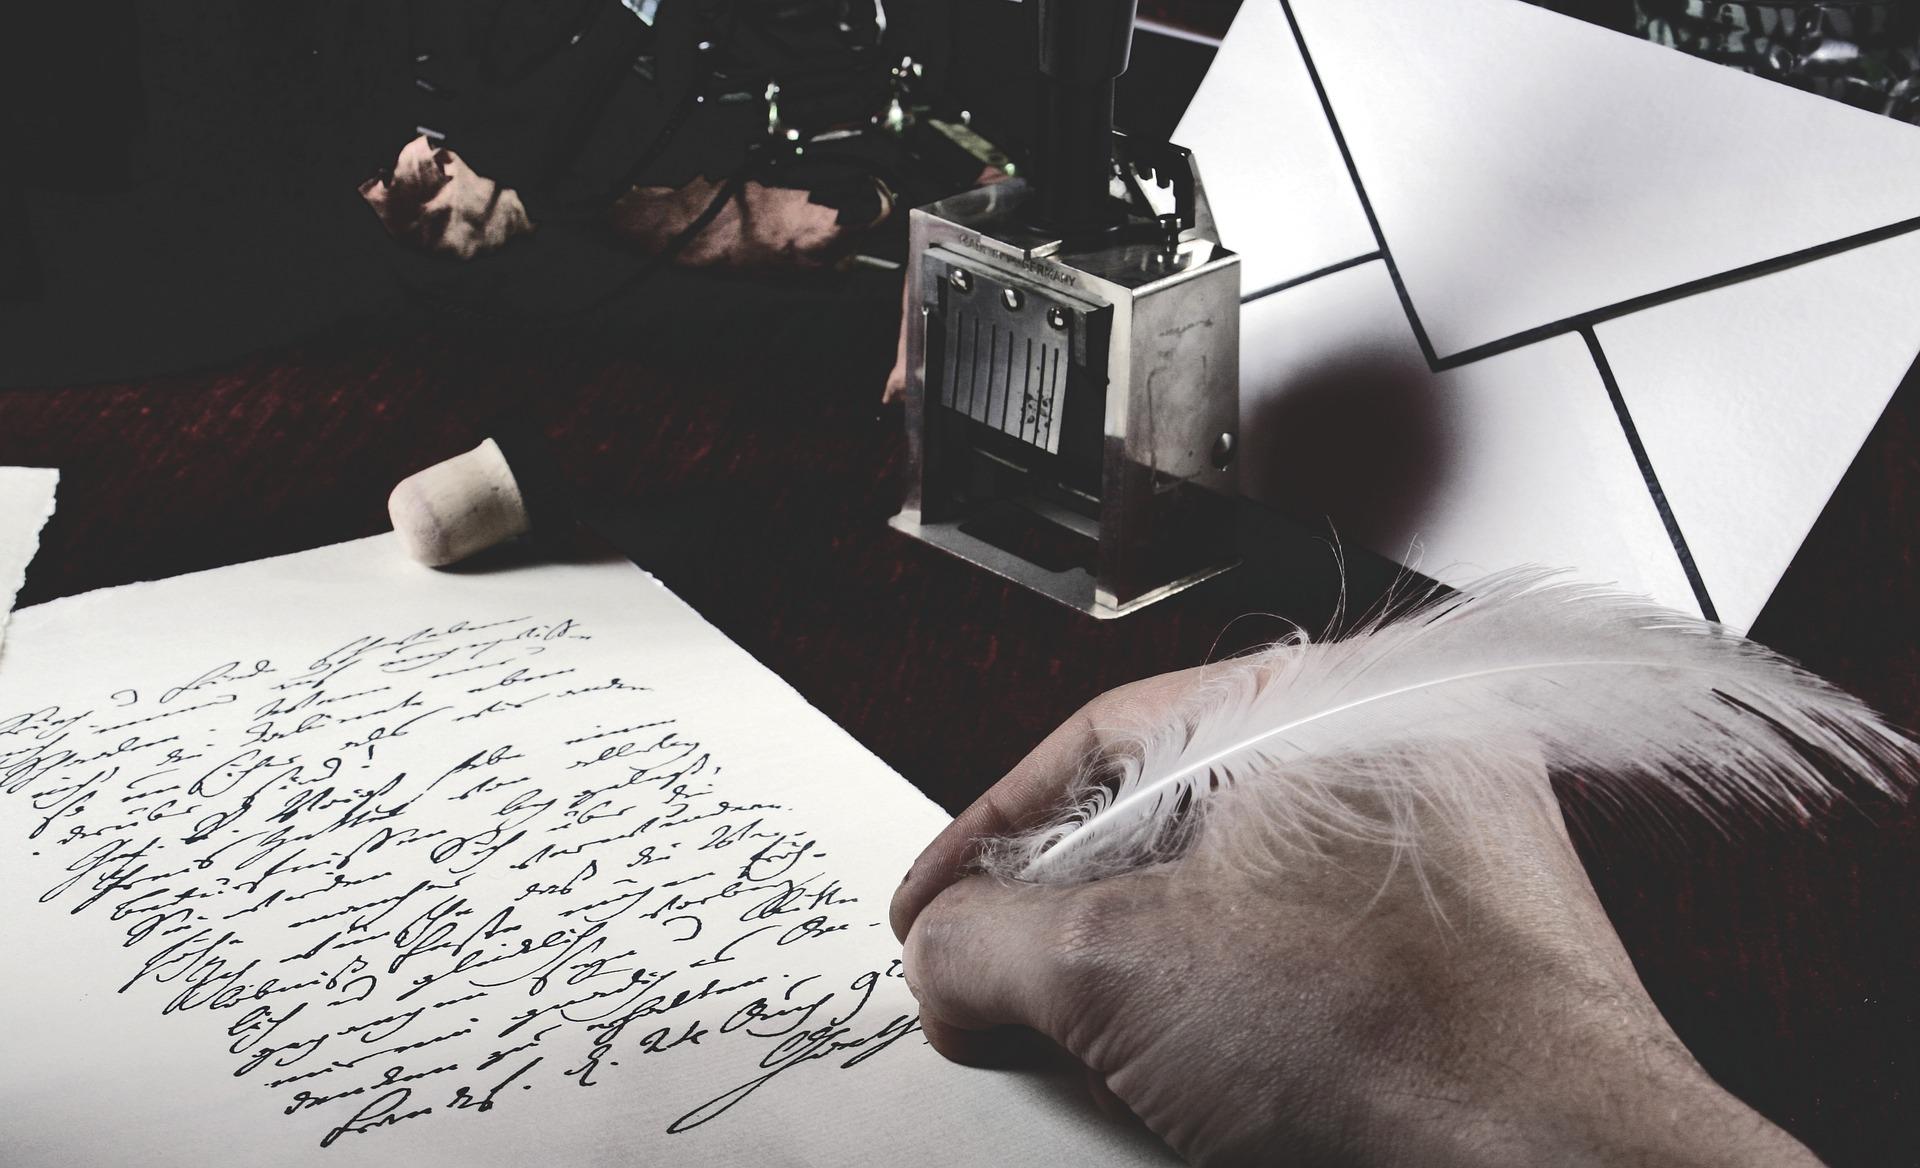 write-1957302_1920